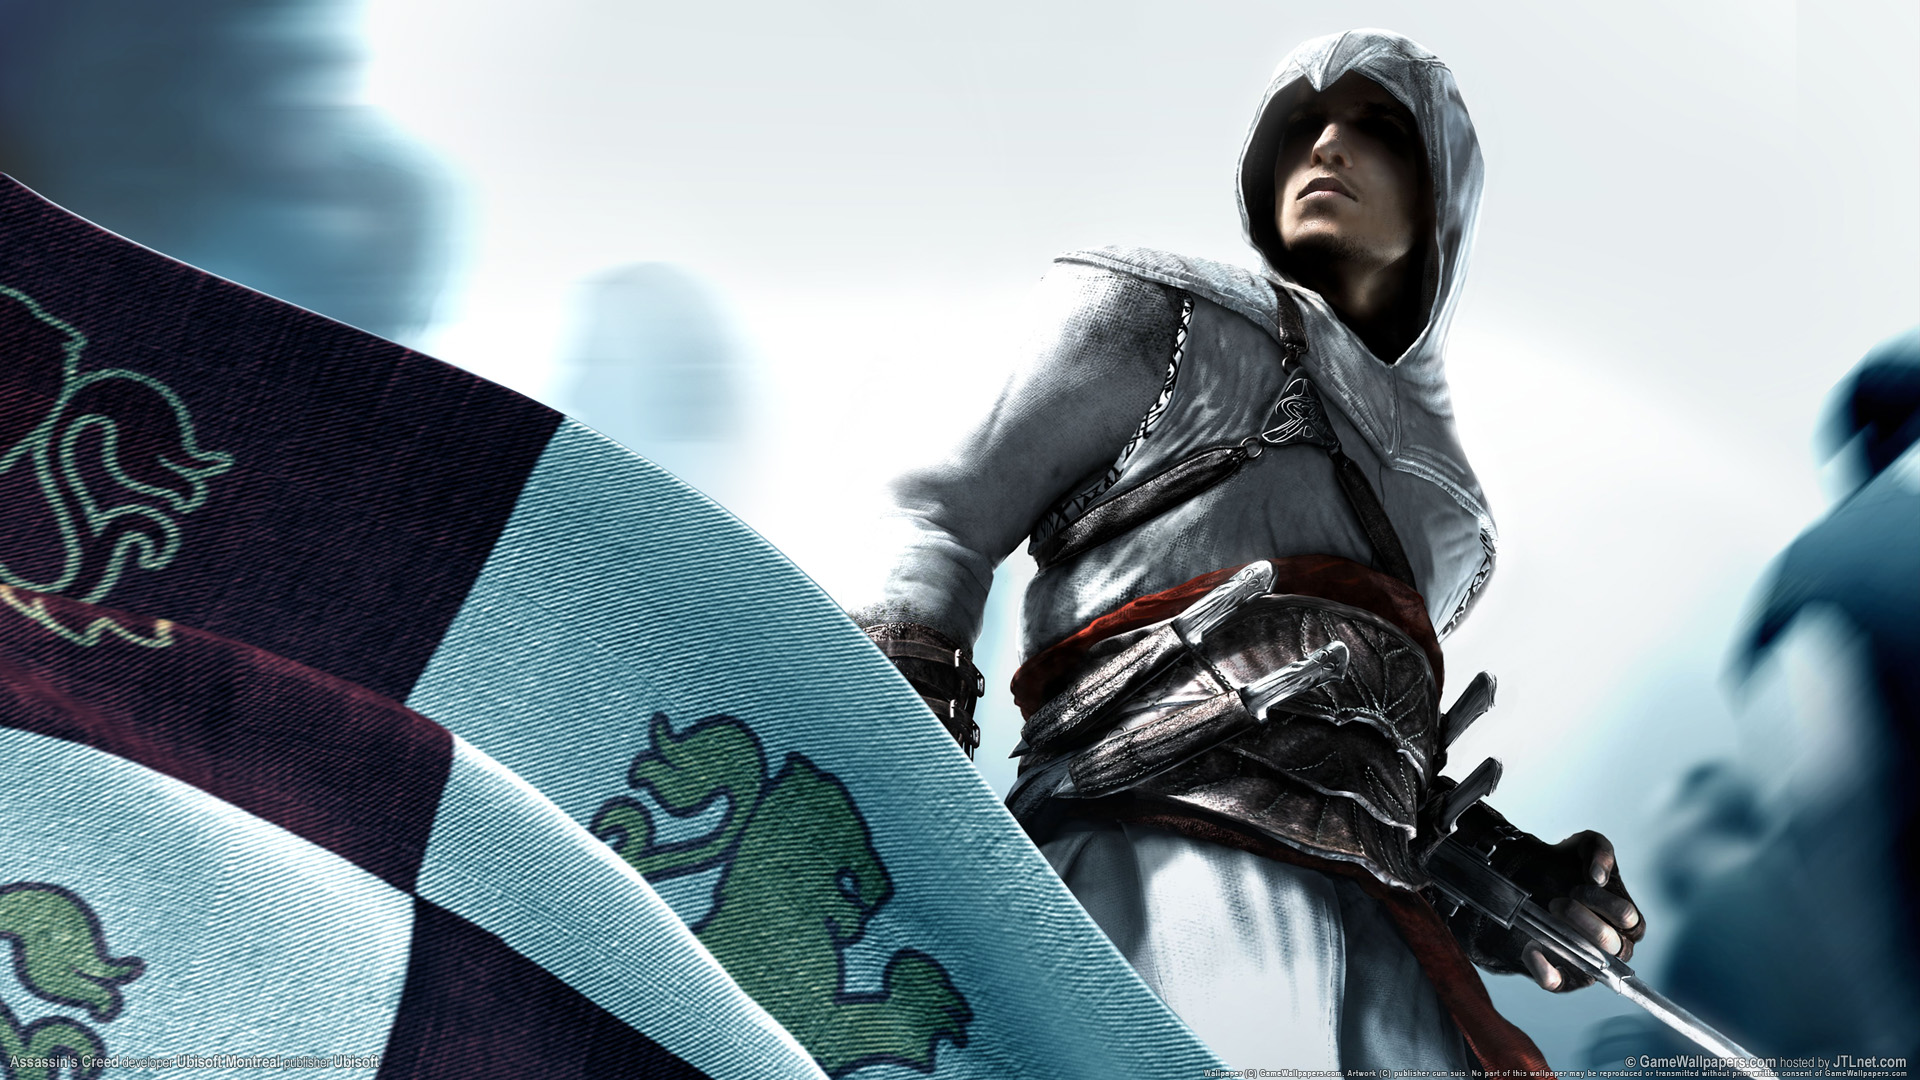 HD Wallpapers Assassins Creed 1080p